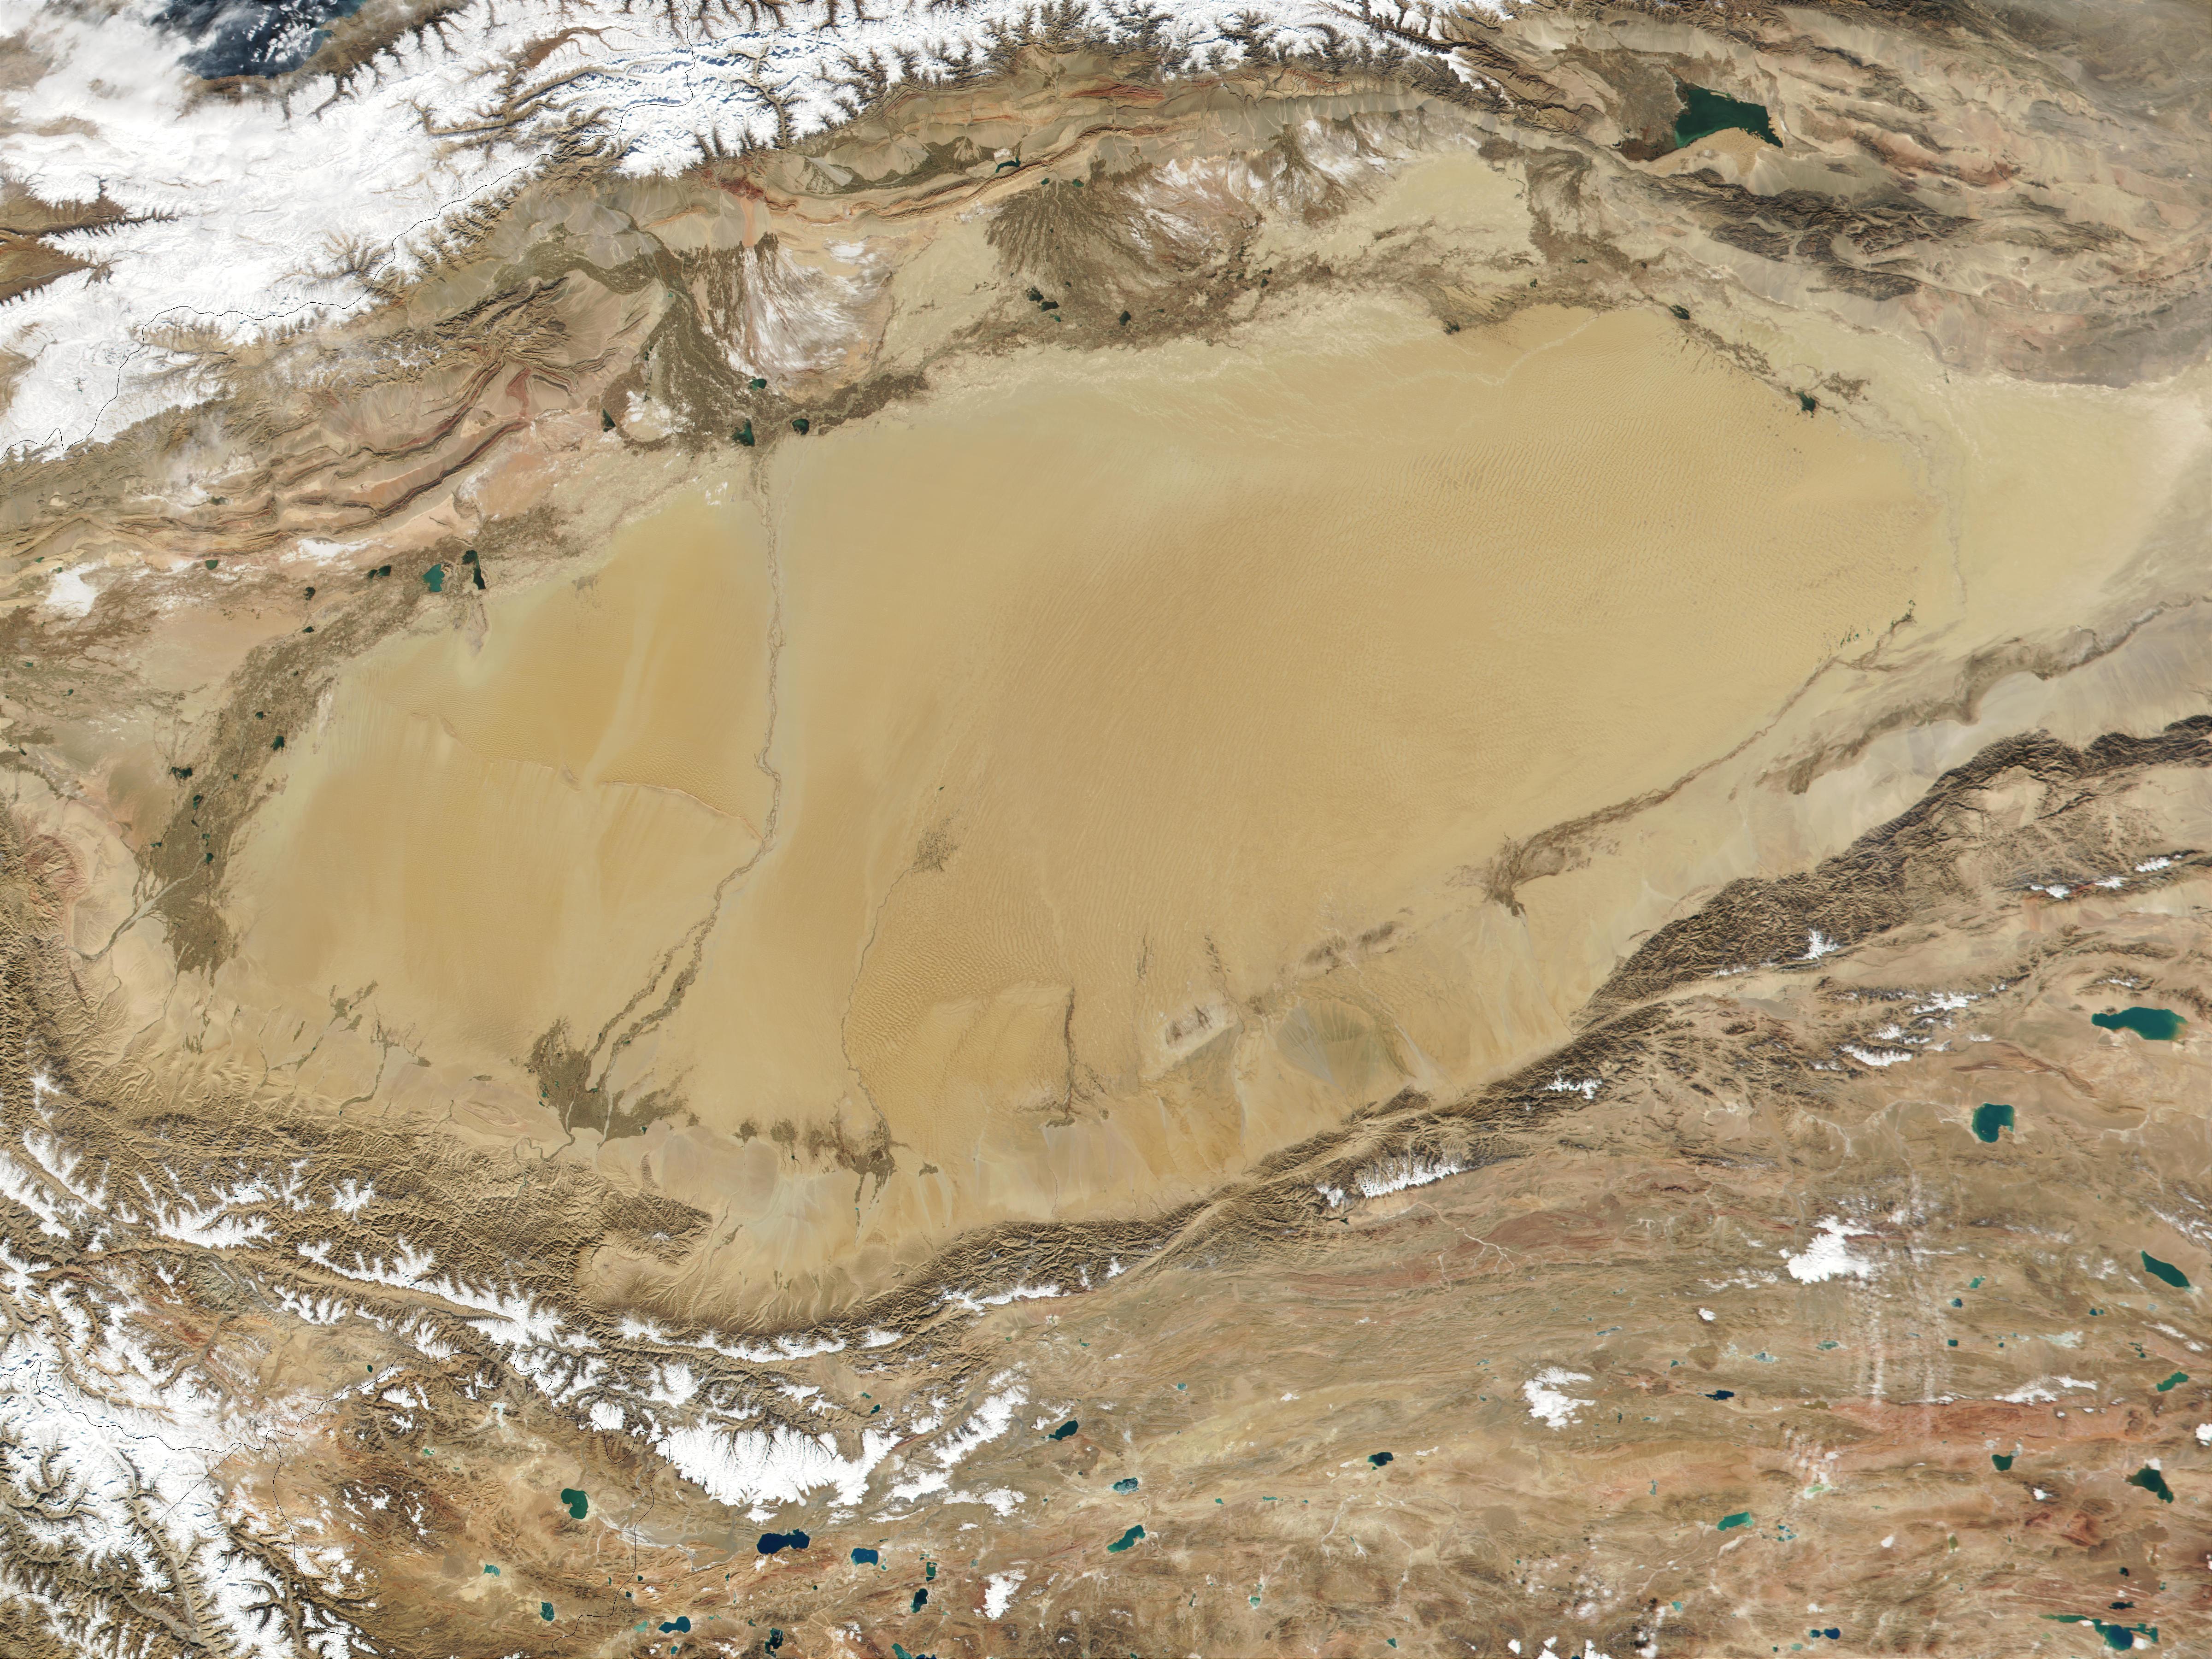 Desierto de Taklamakán, China occidental